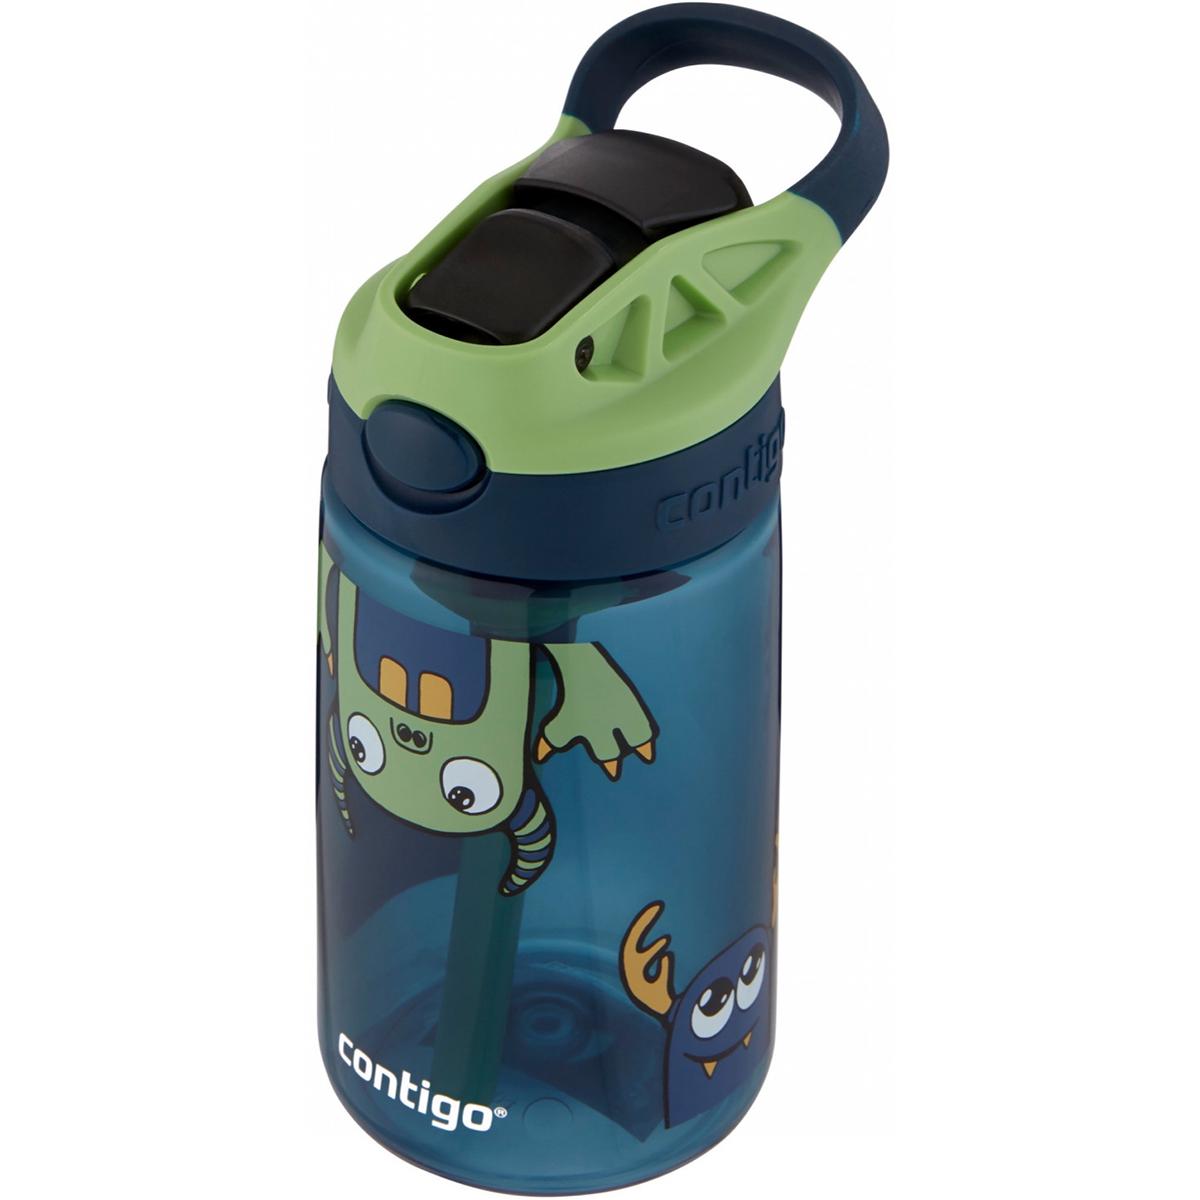 Contigo-Kid-039-s-14-oz-AutoSpout-Straw-Water-Bottle-with-Easy-Clean-Lid thumbnail 30